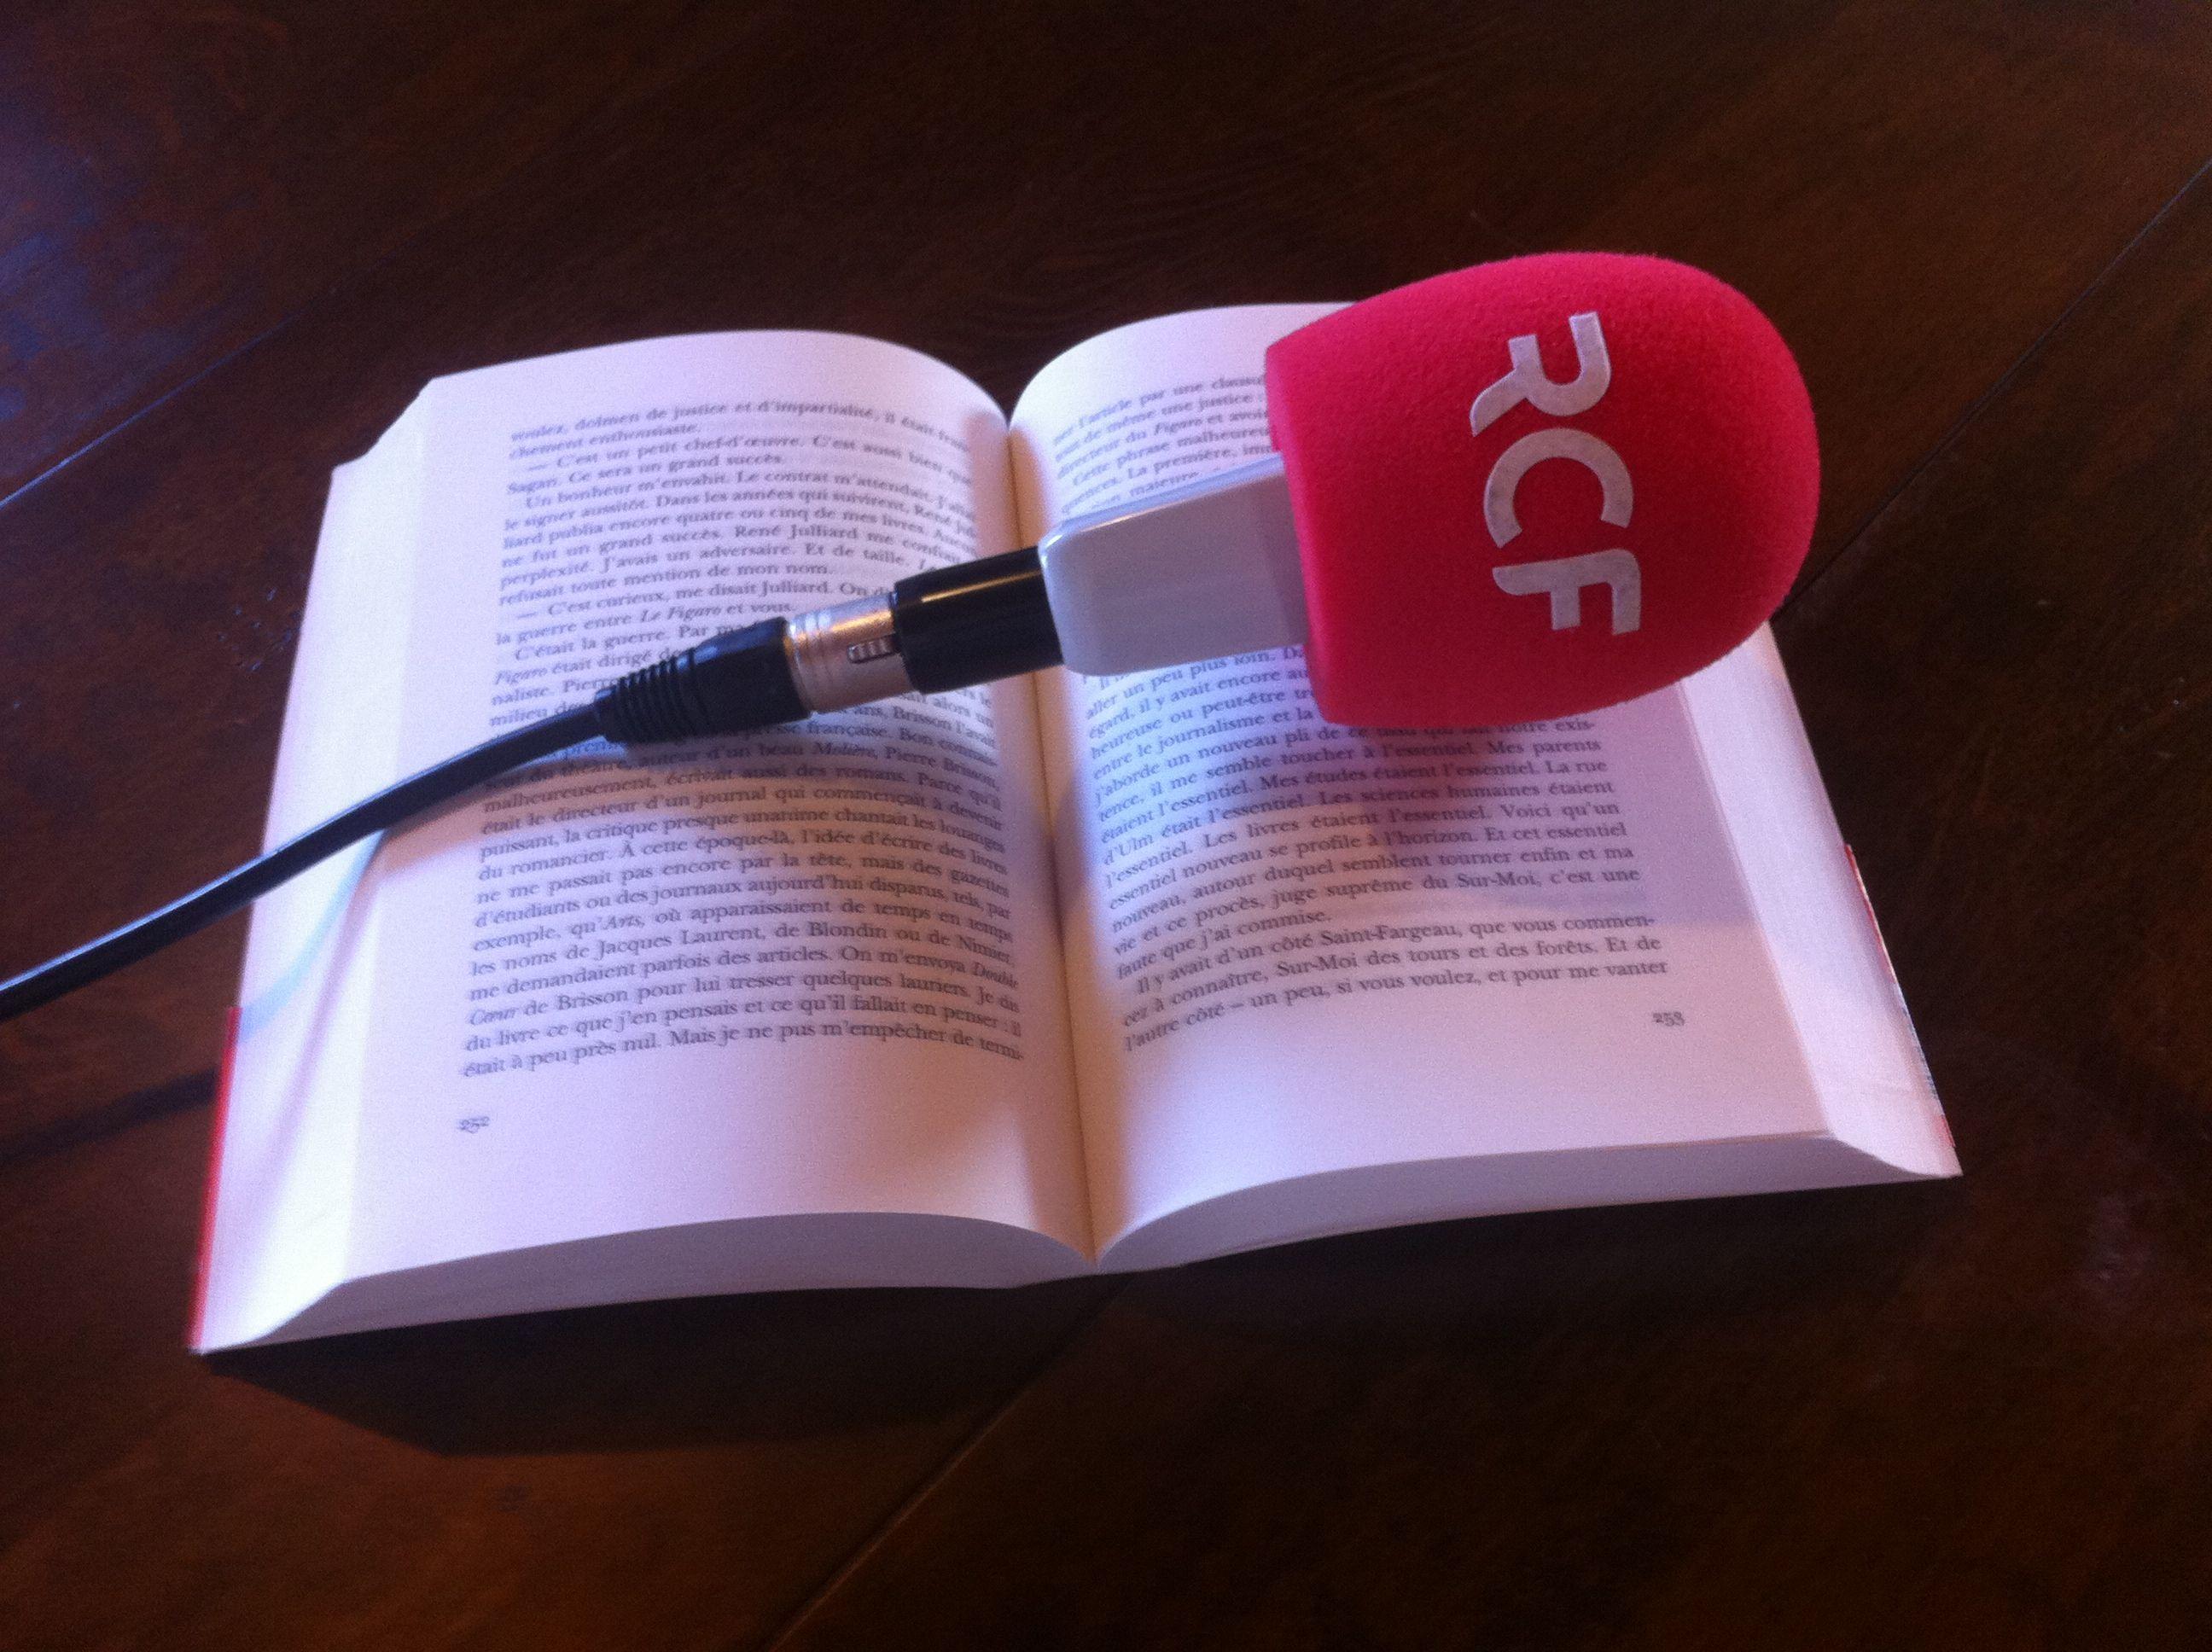 Le MAG 90 - Charente FM : bande originale des radios charentaises